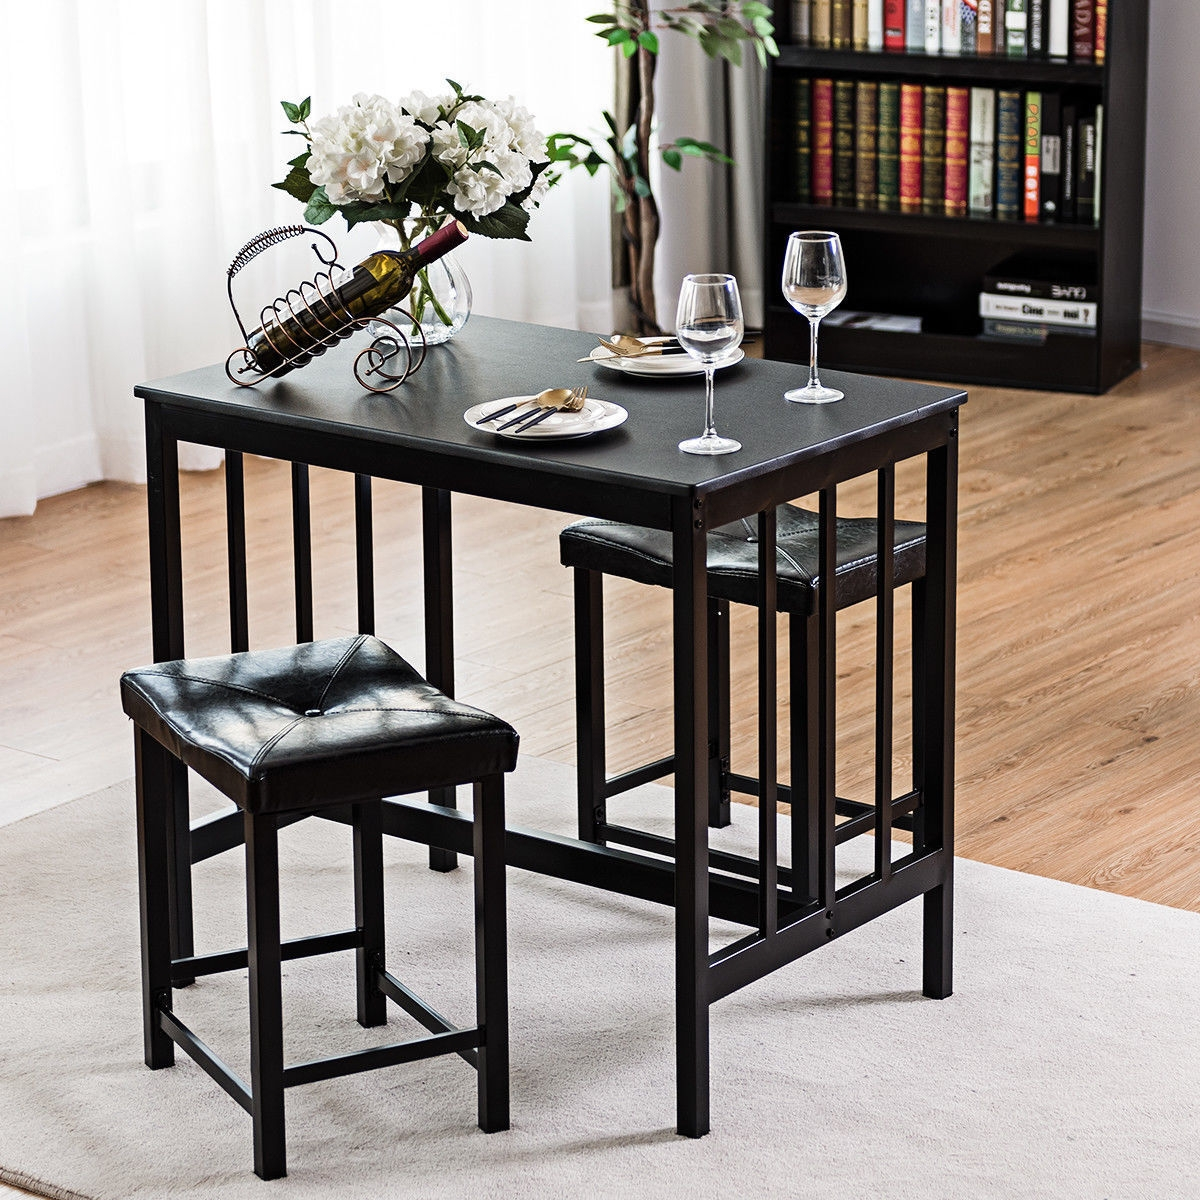 3 pcs Modern Counter Height Dining Set